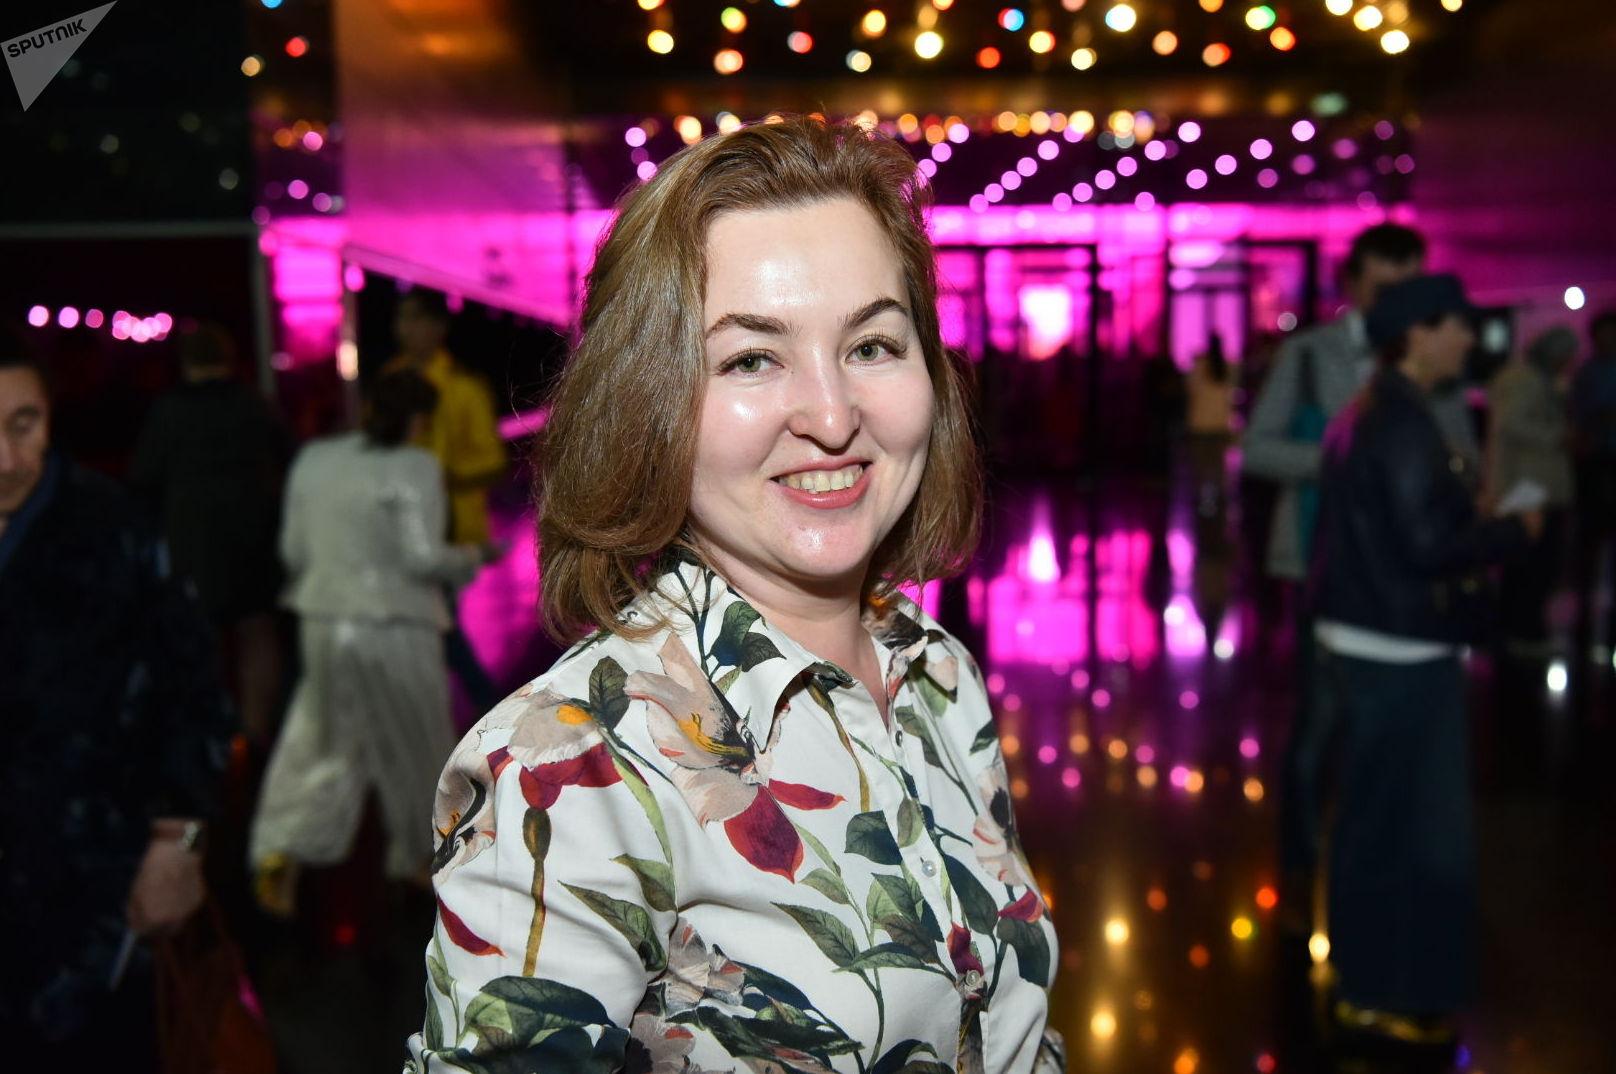 Зрительница Динара Рыскулова